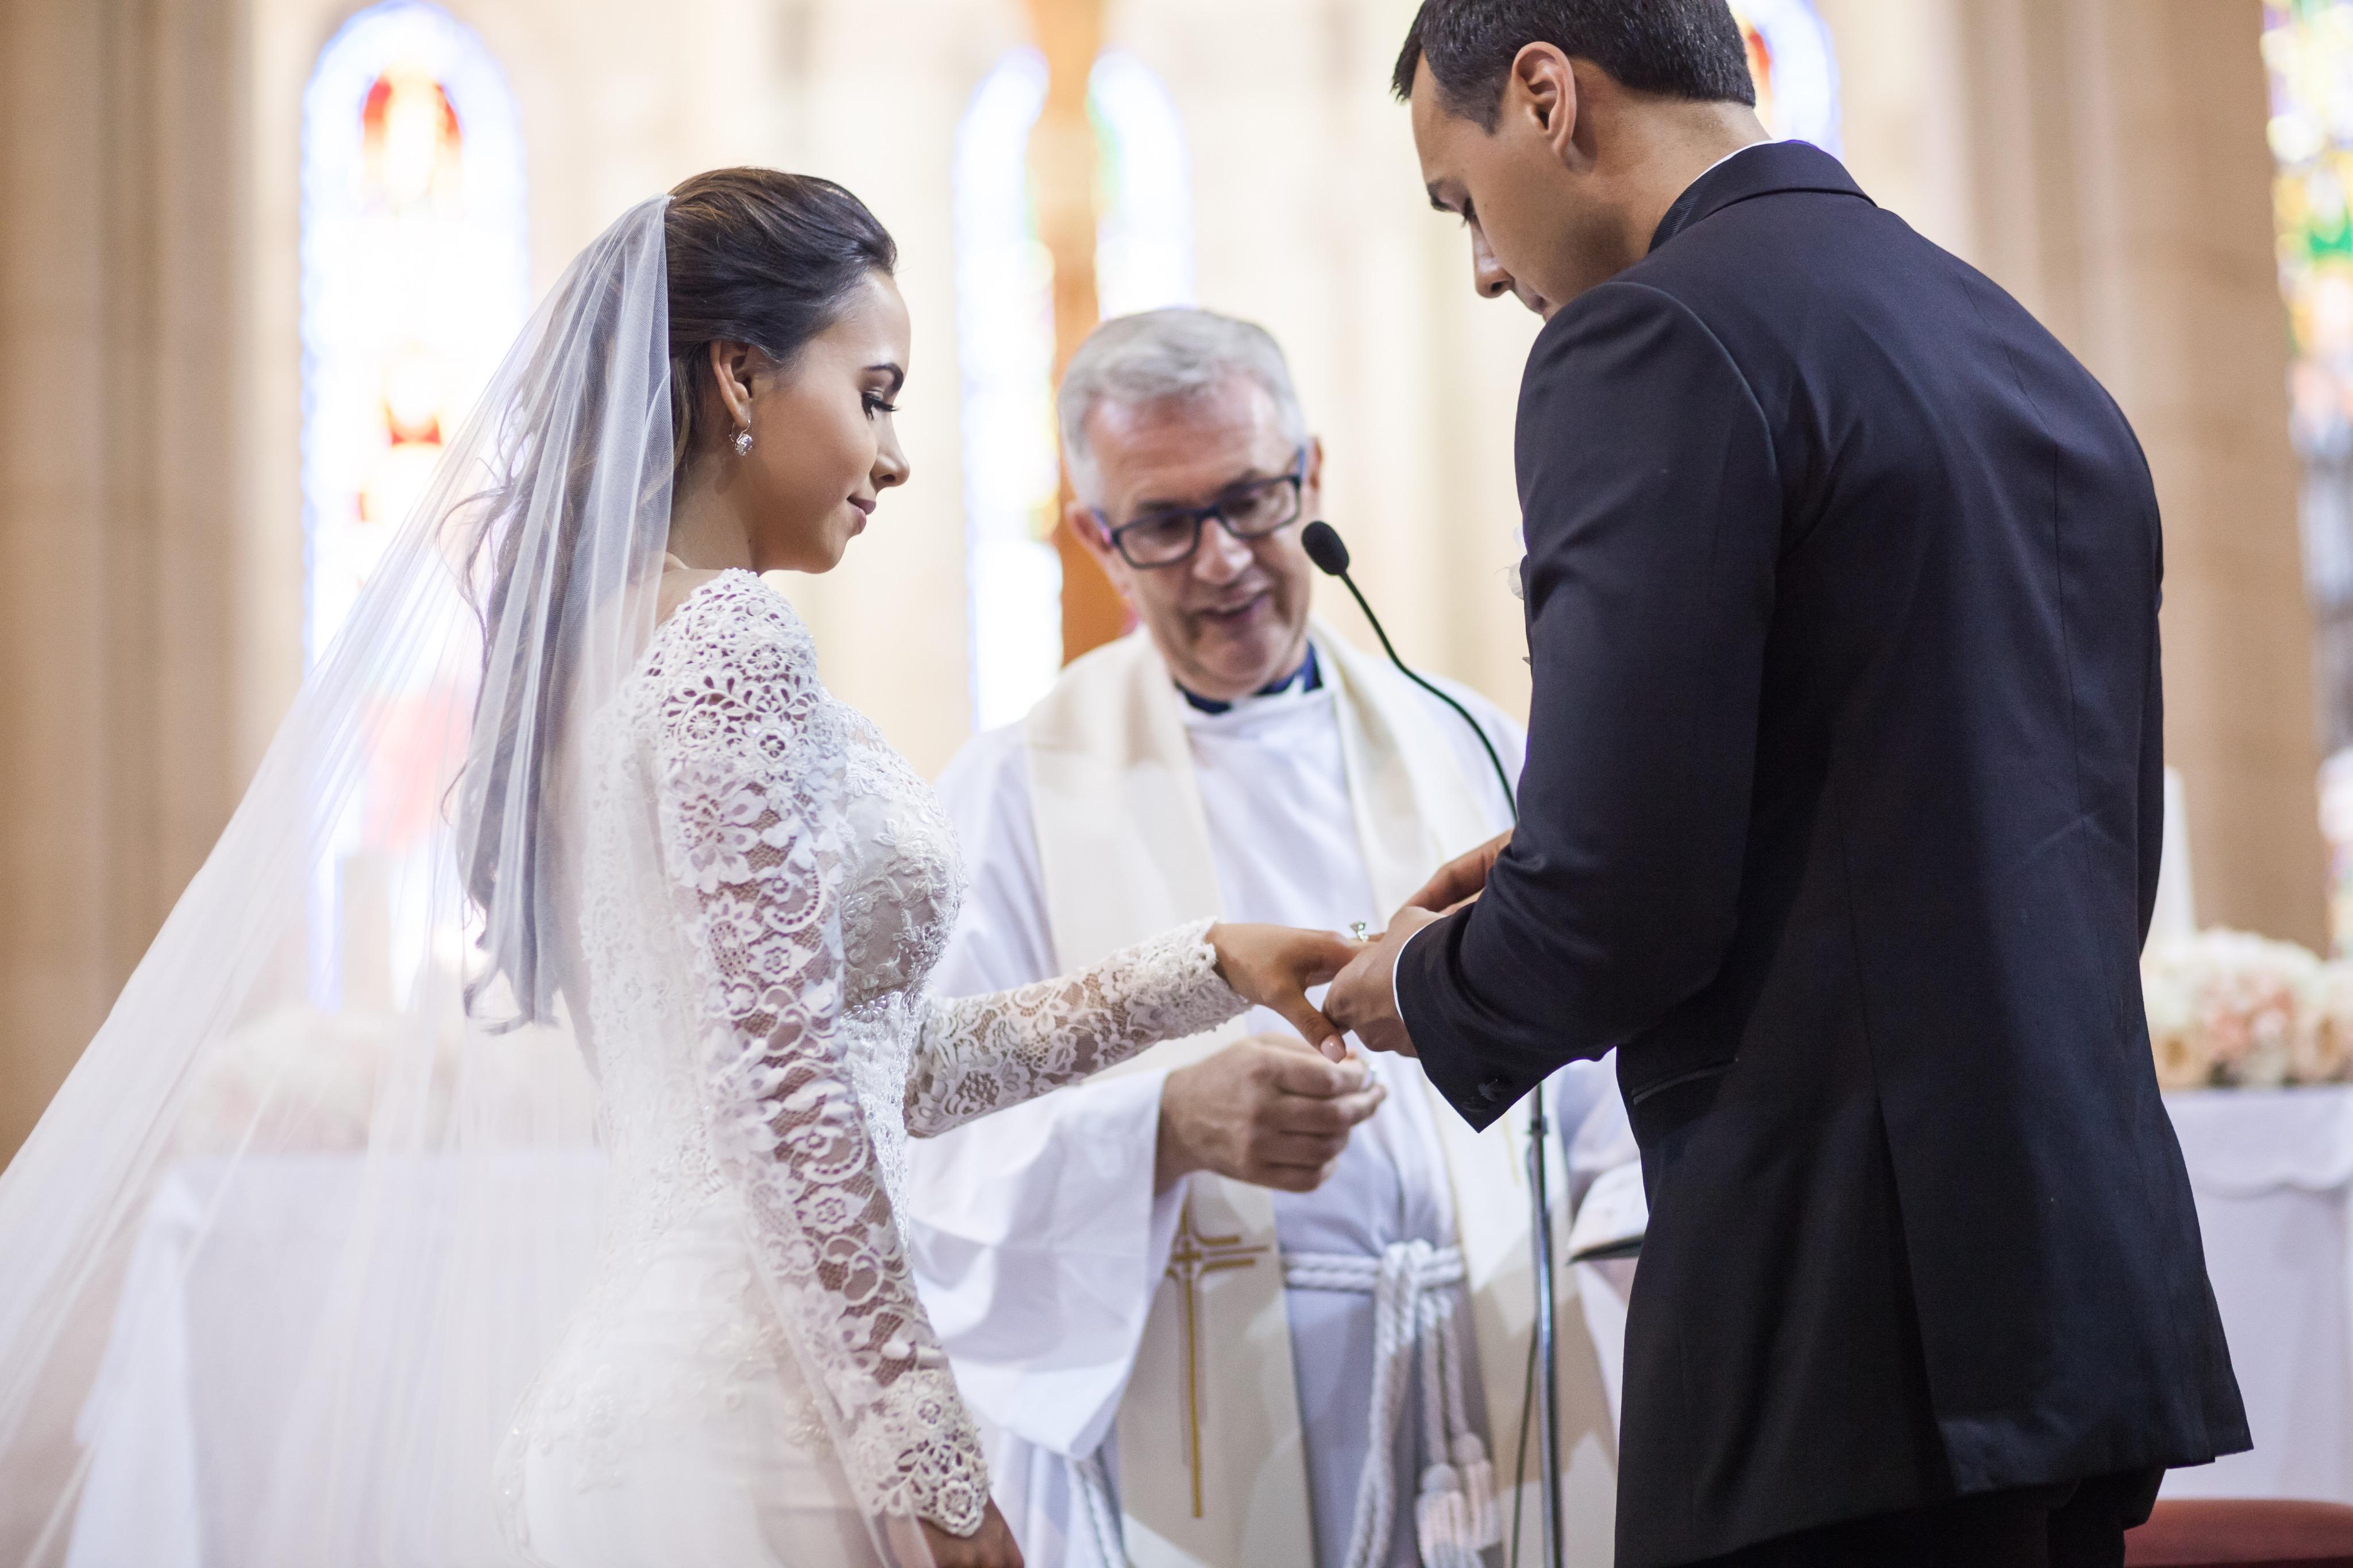 Lisa Morales and Jason Duke wedding. Barcelona, Spain. 2017. (Credit: Rares Pulbere)